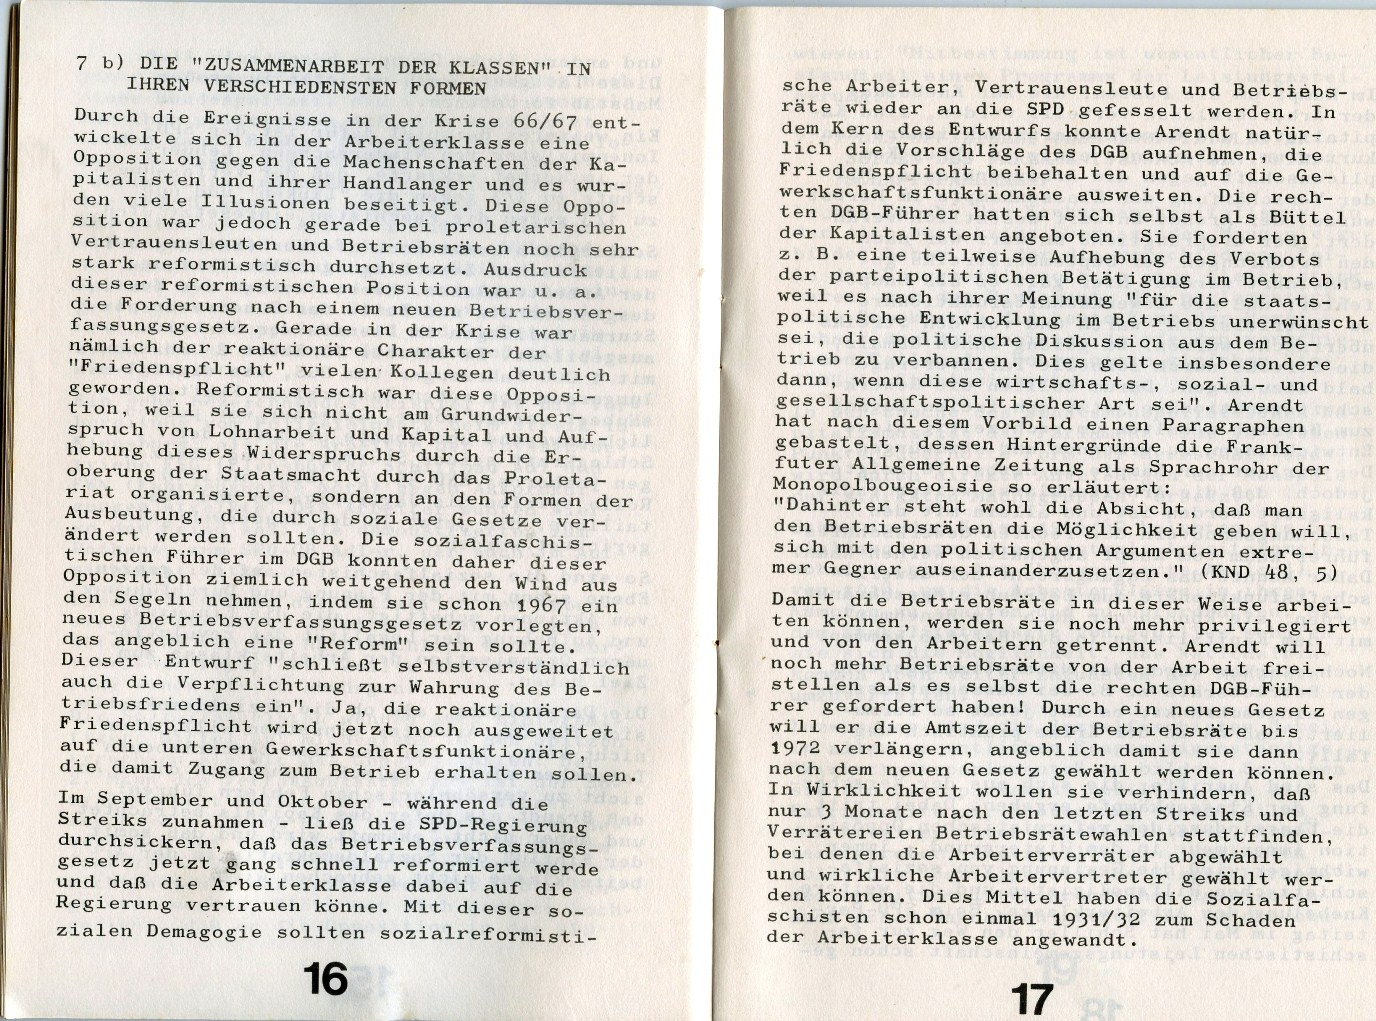 KJVD_Sozialdemokratie_Sozialfaschismus_1971_10